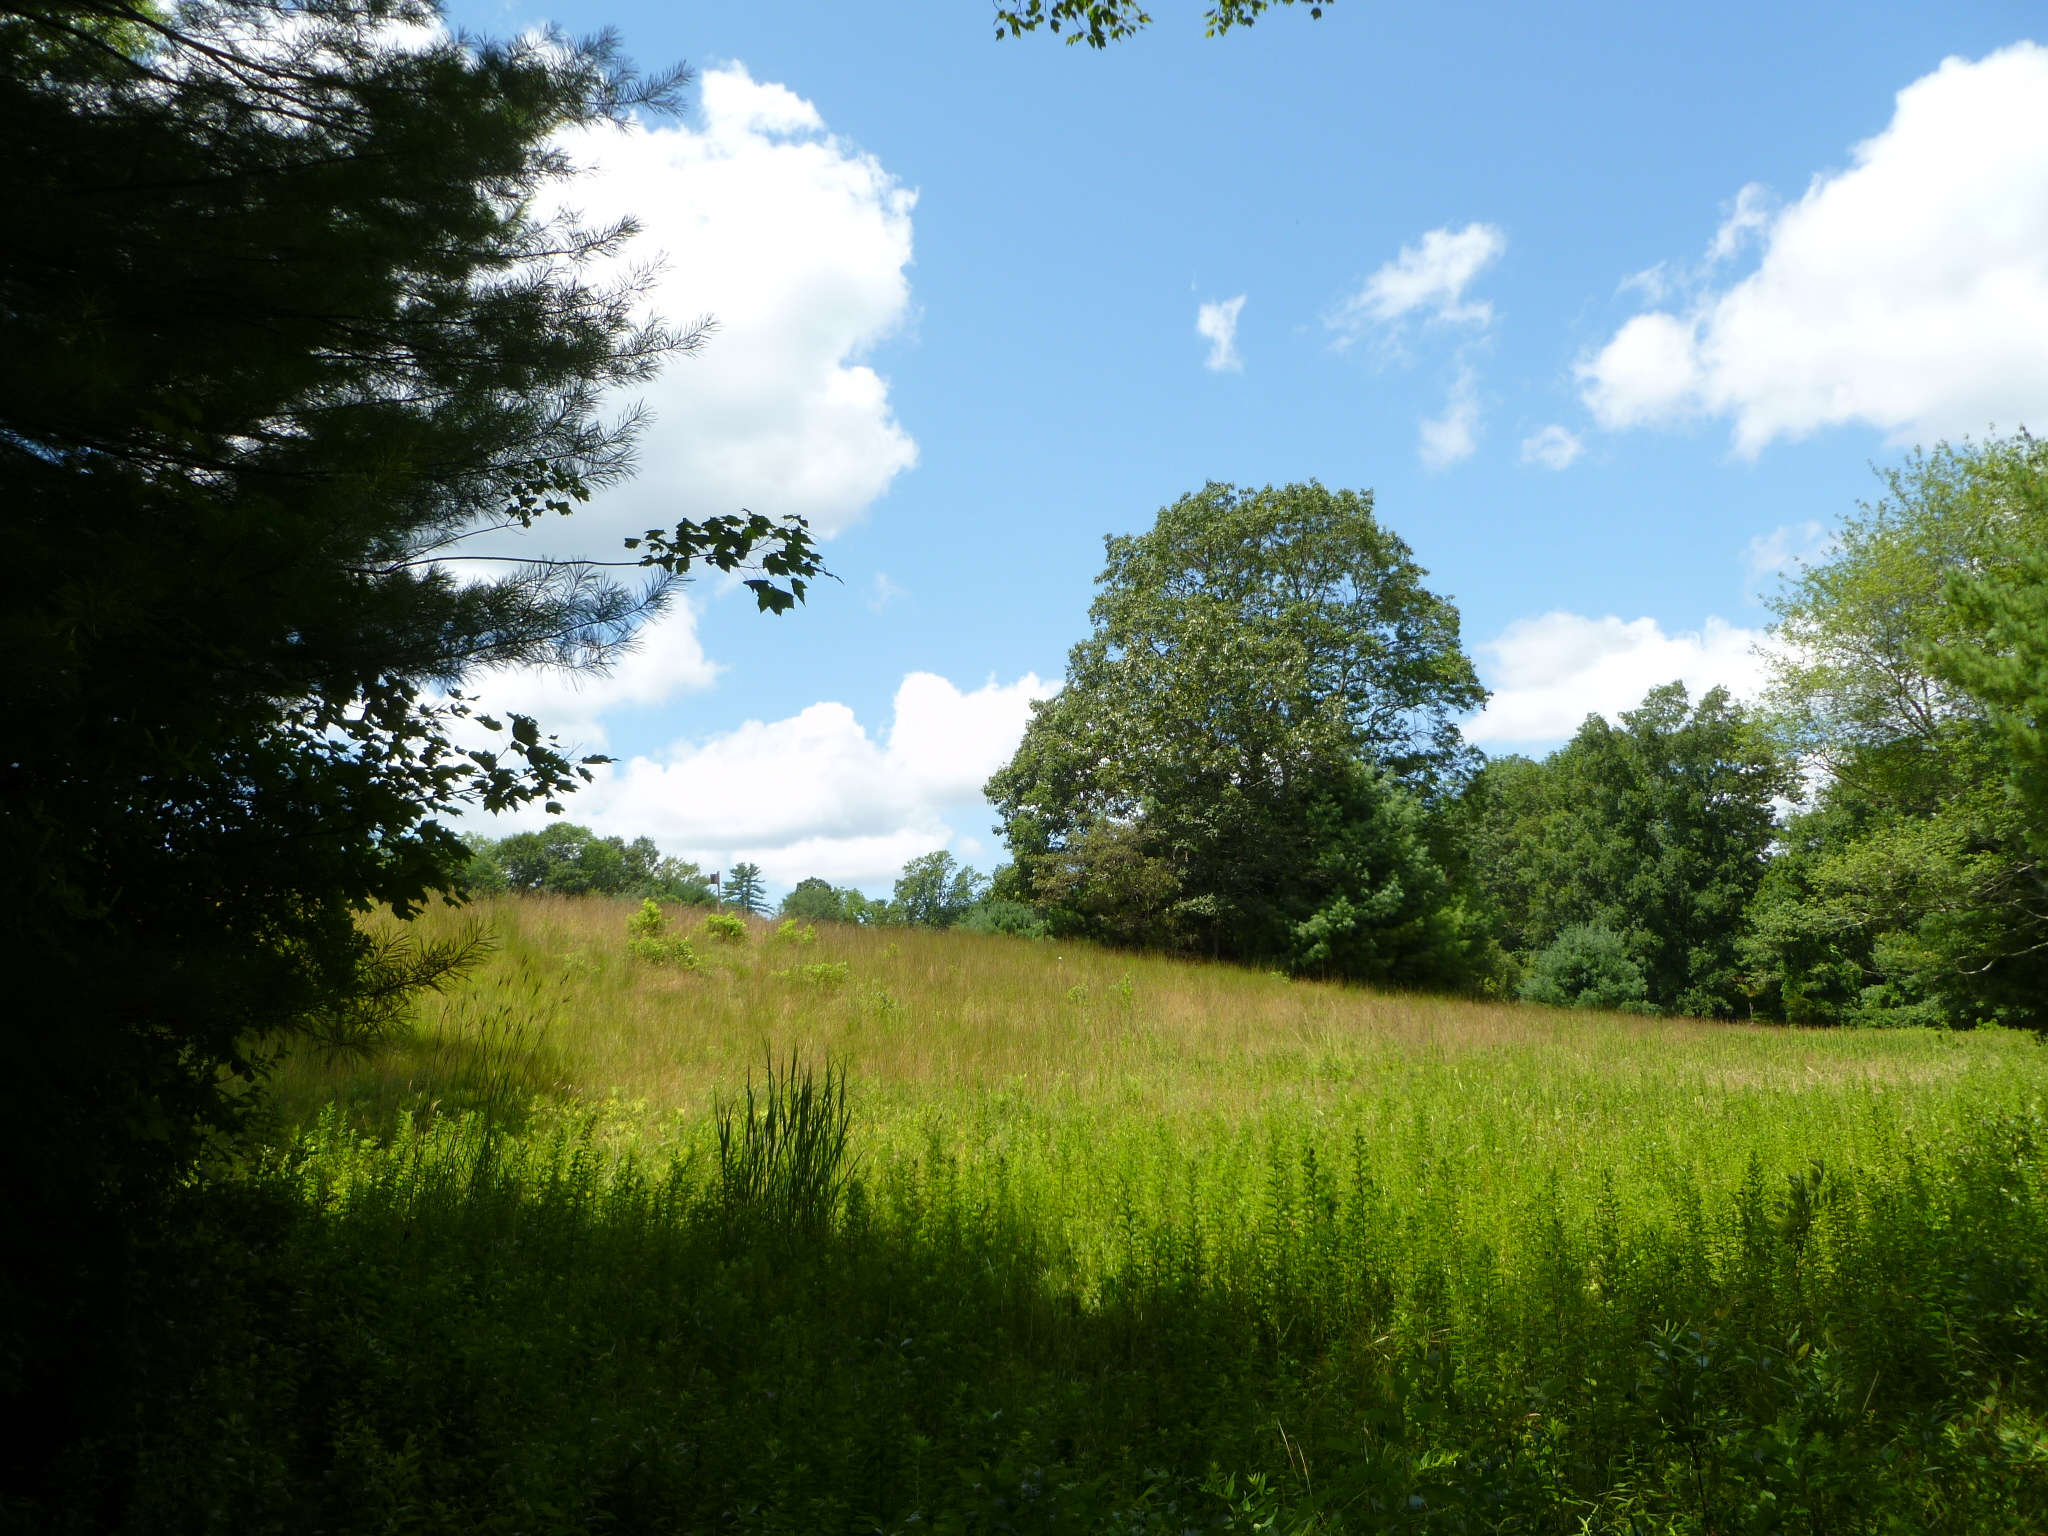 Audubon Society of Rhode Island Fisherville Brook Wildlife Refuge Exeter Birds Birdwatching environment hiking